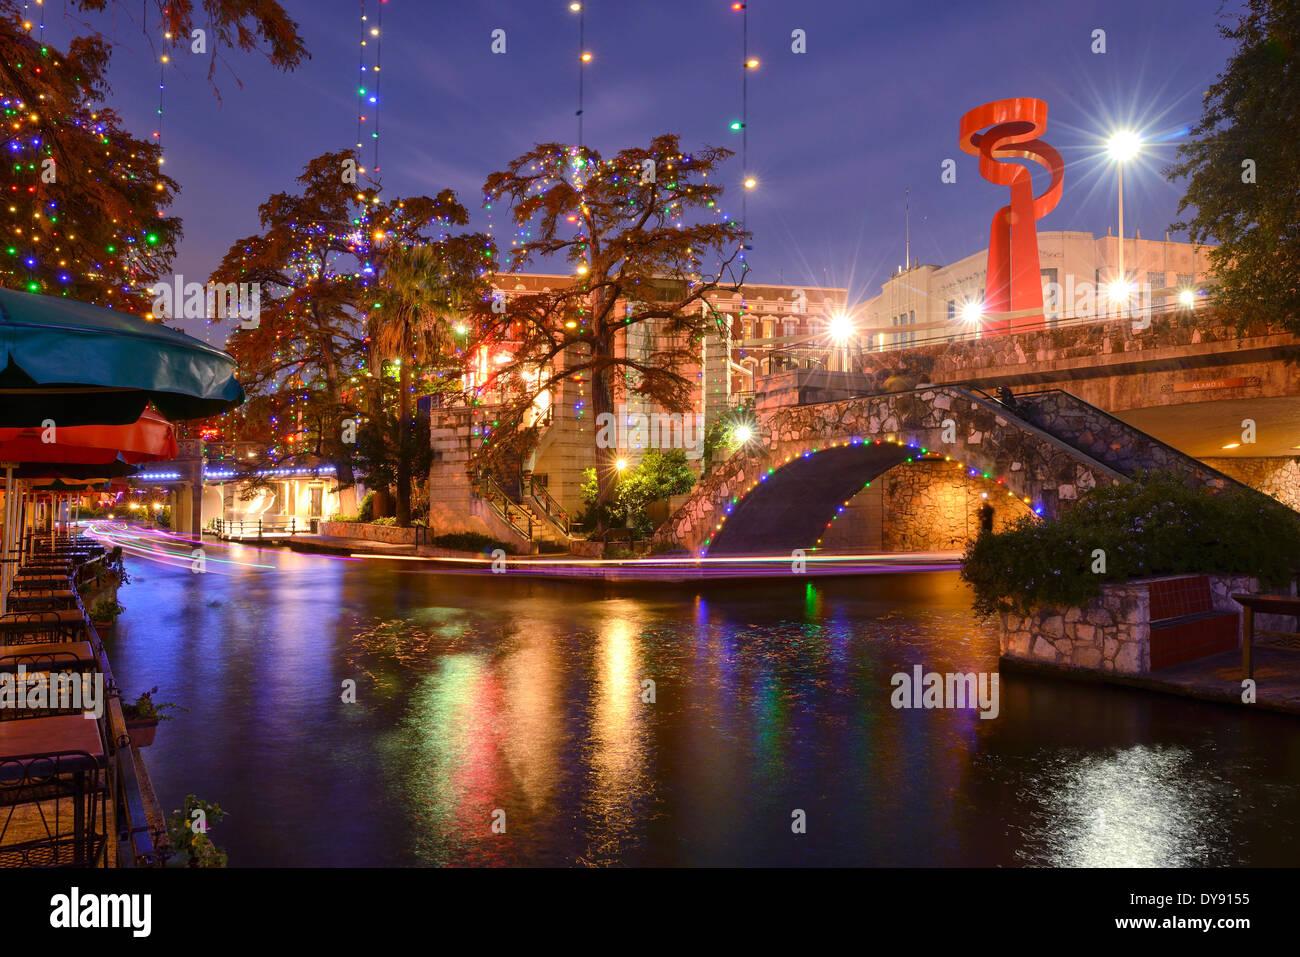 USA, United States, America, Texas, San Antonio, River Walk, dusk, lights, evening - Stock Image